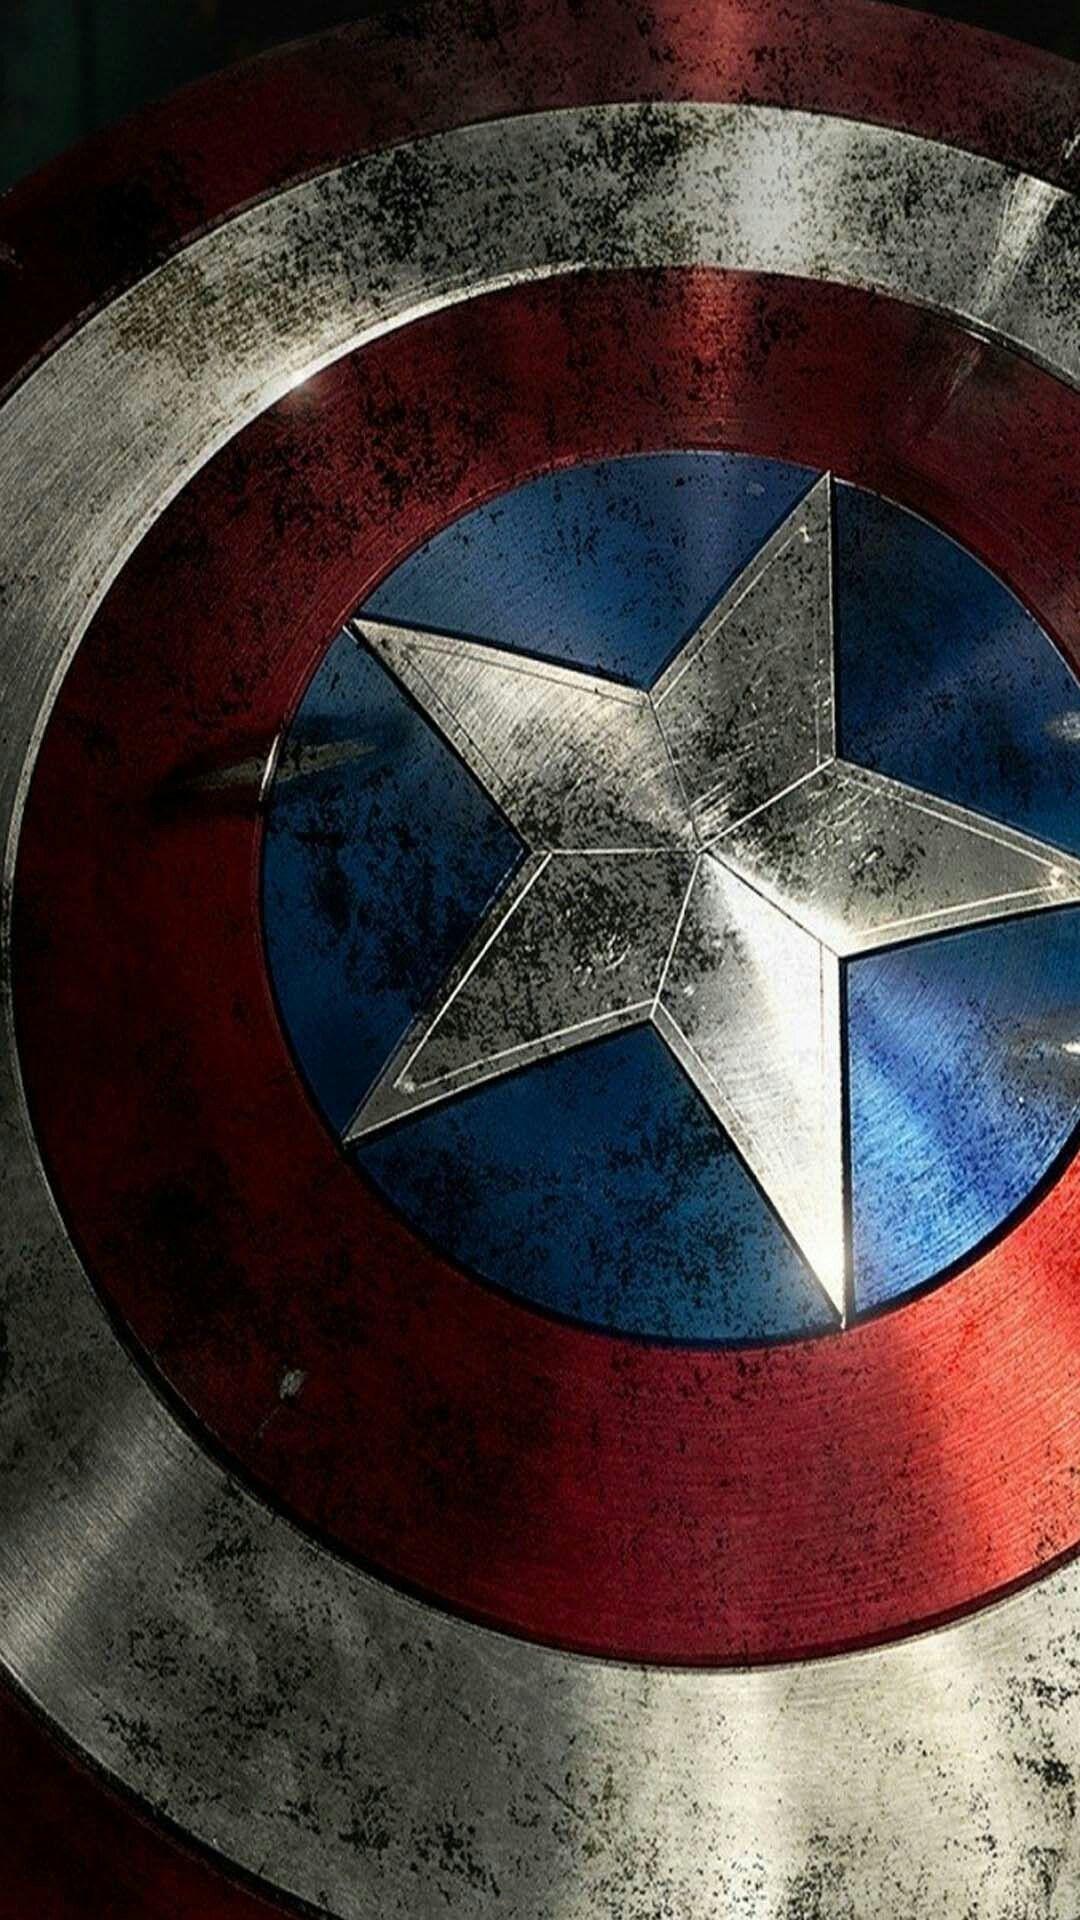 Pin By Max Nunez On Marvel Captain America Wallpaper Captain America Shield Wallpaper Avengers Wallpaper